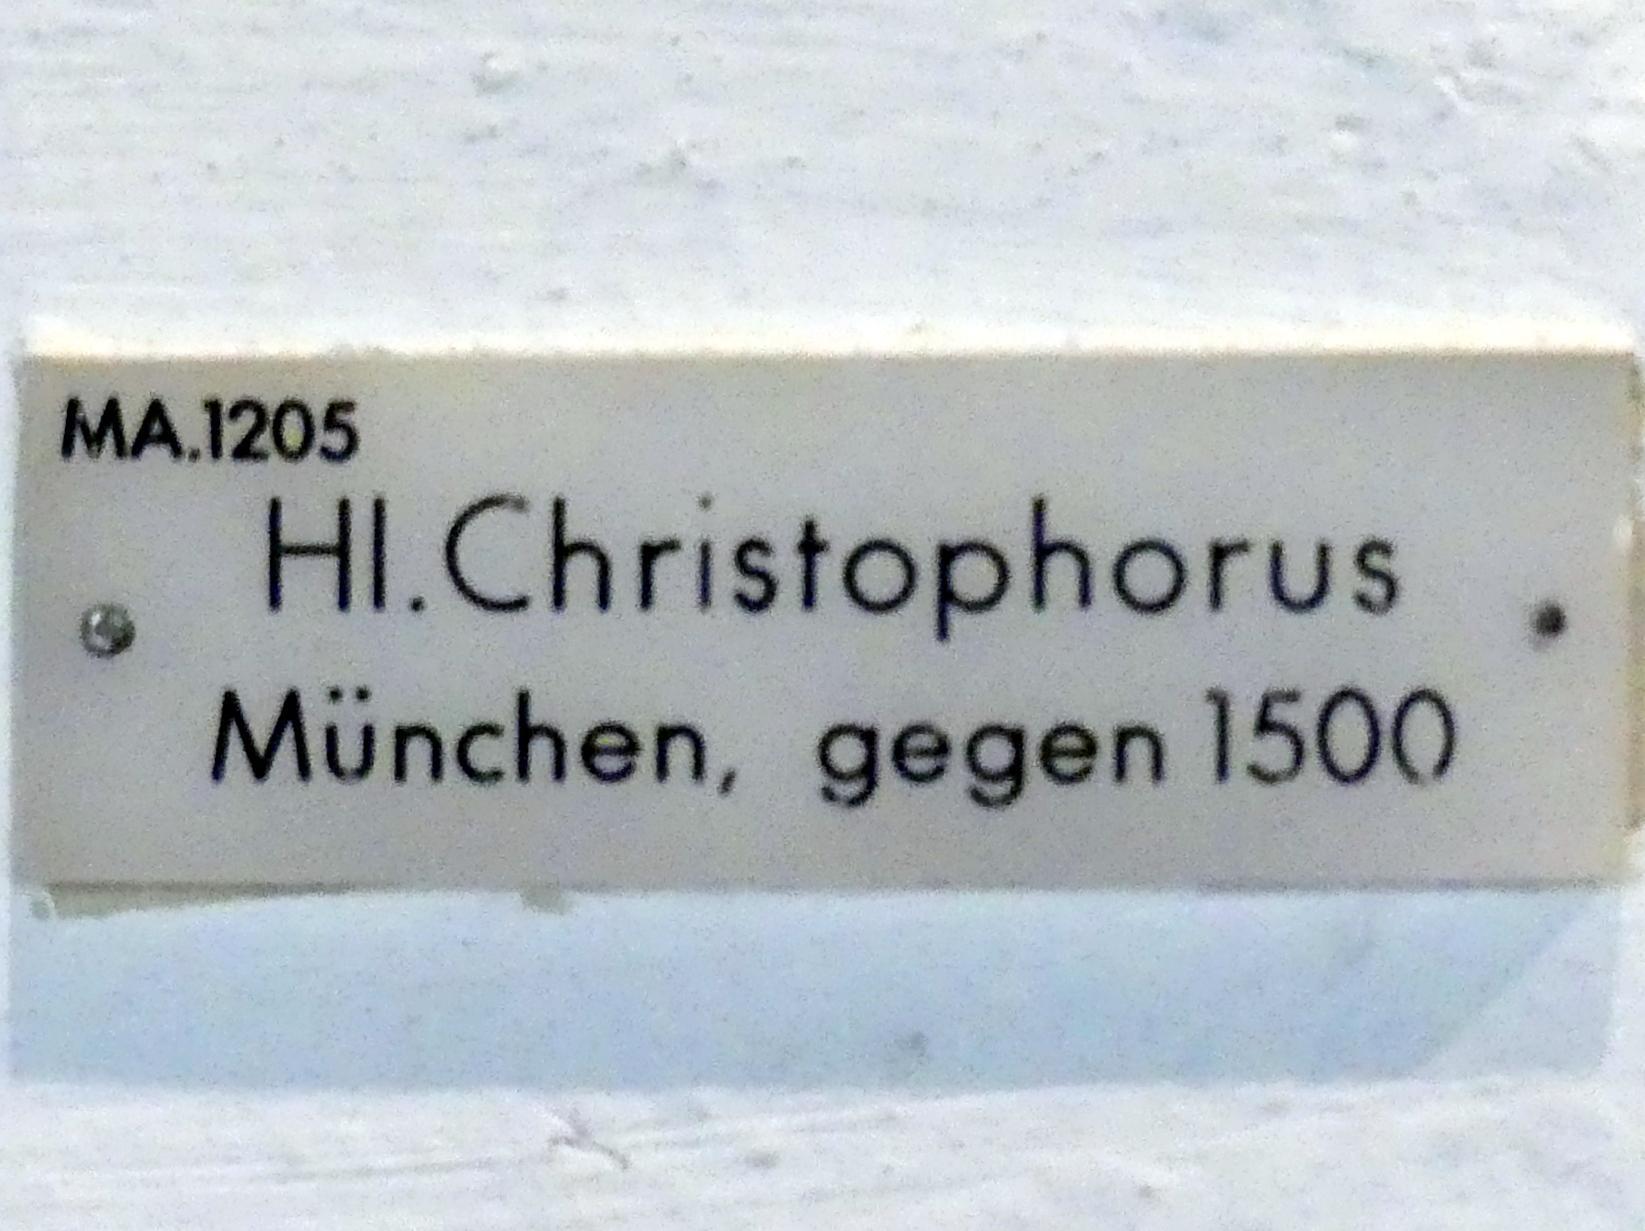 Hl. Christophorus, um 1490 - 1500, Bild 4/5